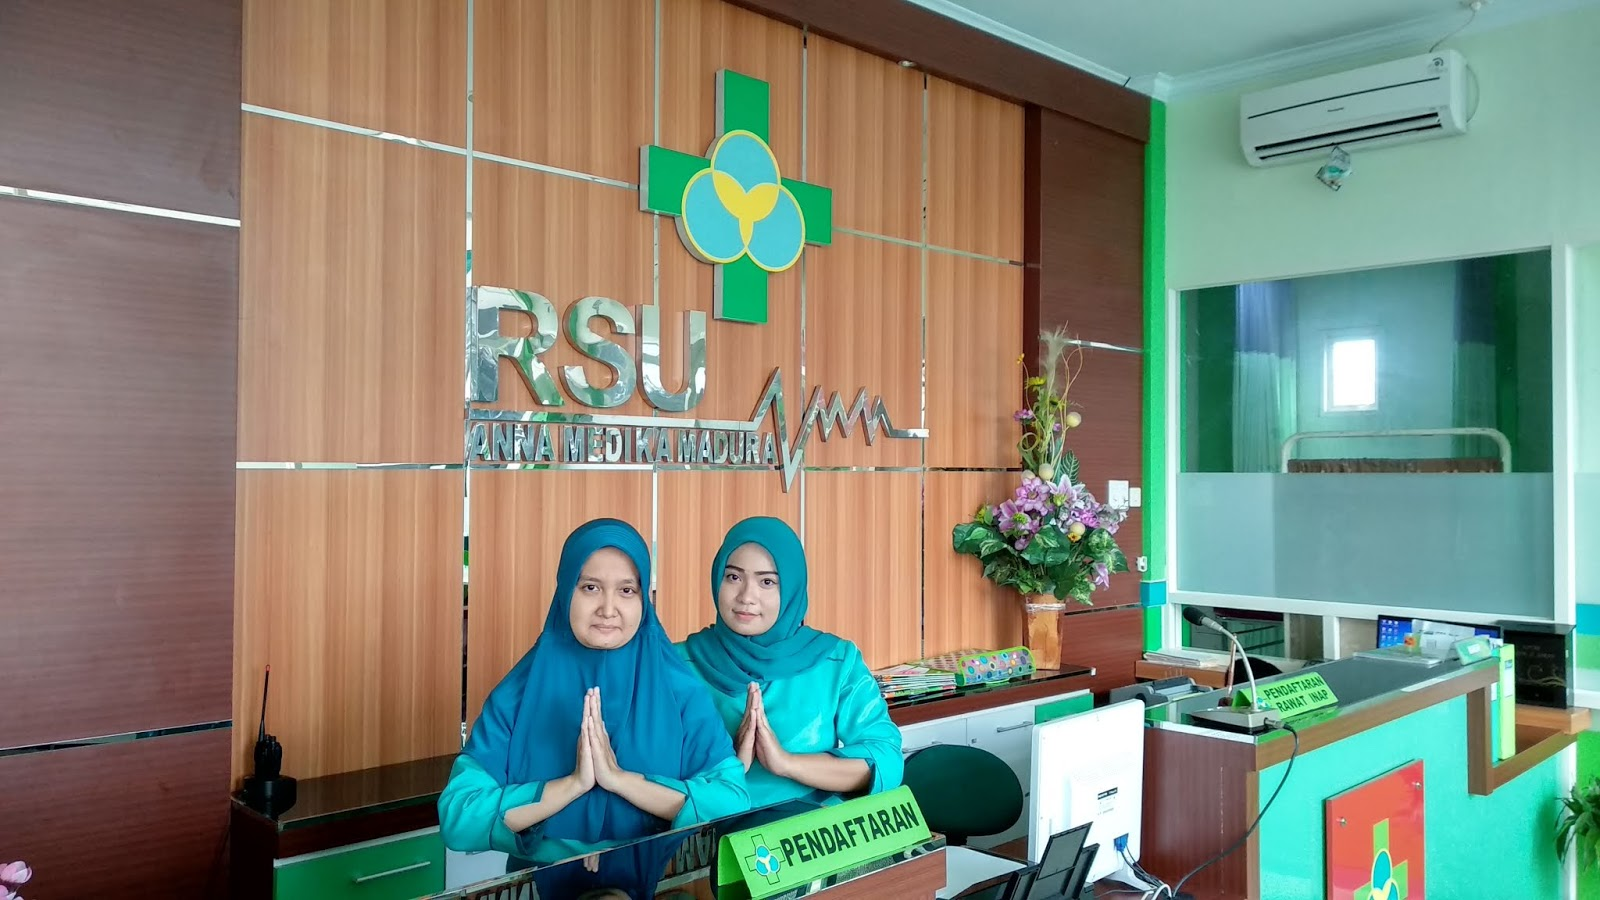 63 Gambar Rumah Sakit Anna Medika Terbaik